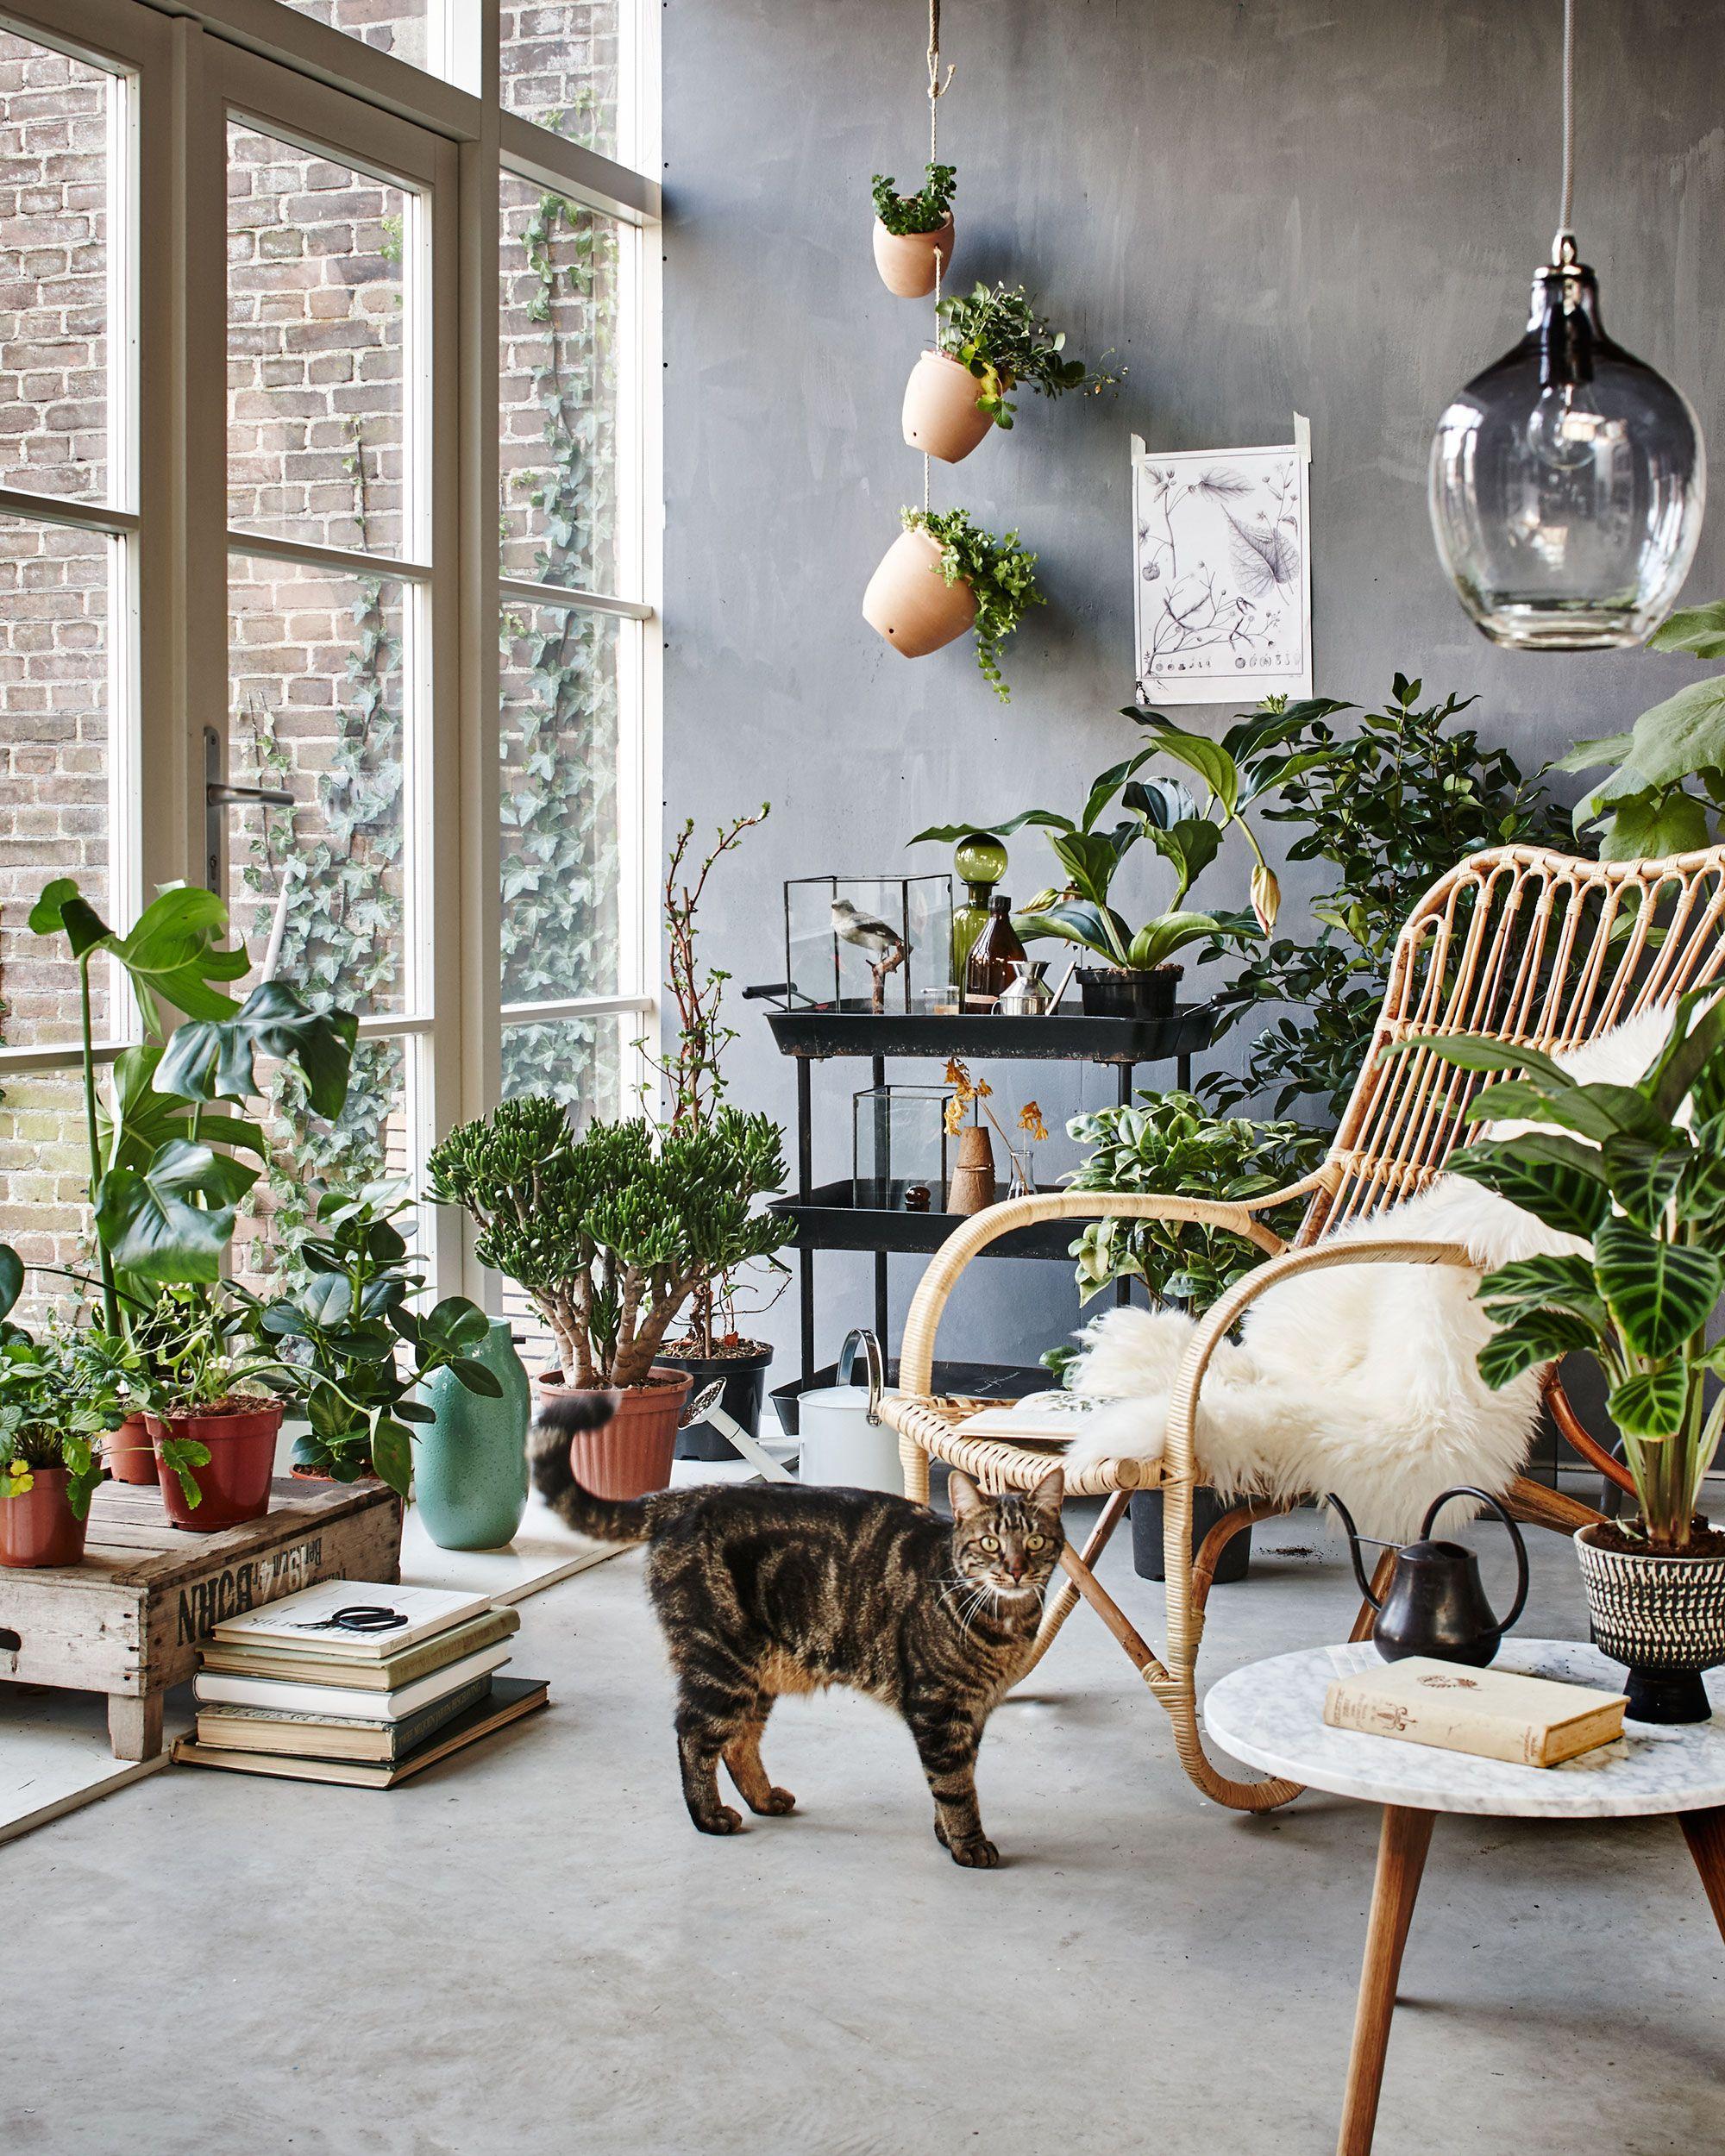 Botanic Living Room / Orangery With A Rotan Chair, Plants ... dedans Botanic Salon De Jardin